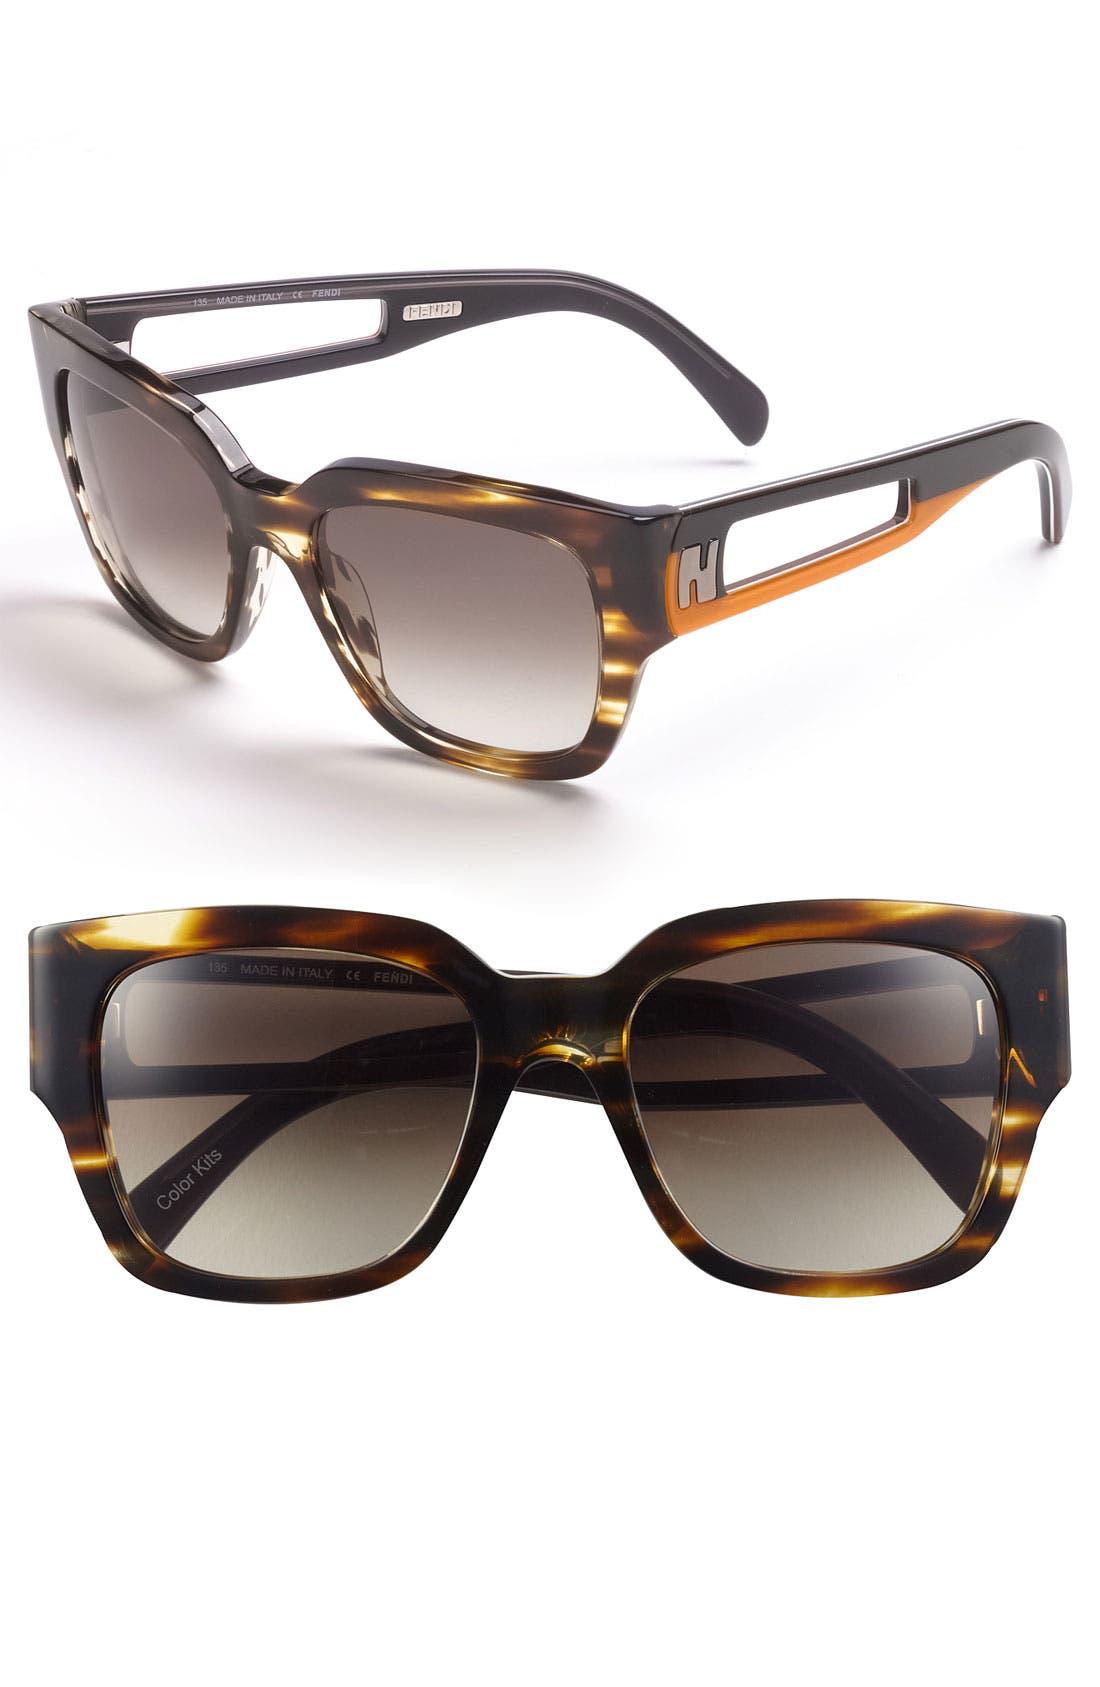 Main Image - Fendi 52mm Retro Sunglasses